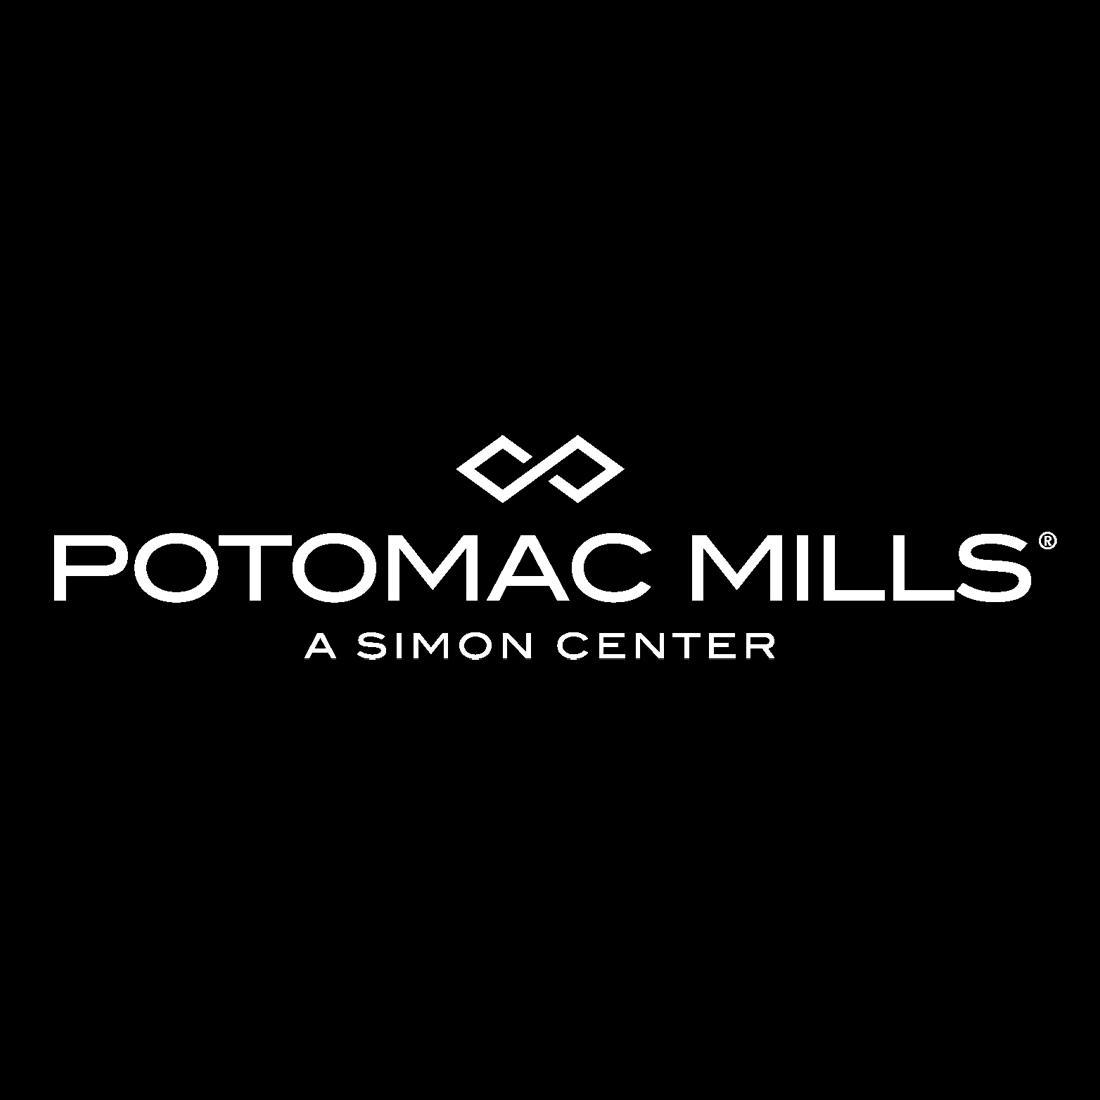 Potomac Mills - Woodbridge, VA - Factory Outlet Stores